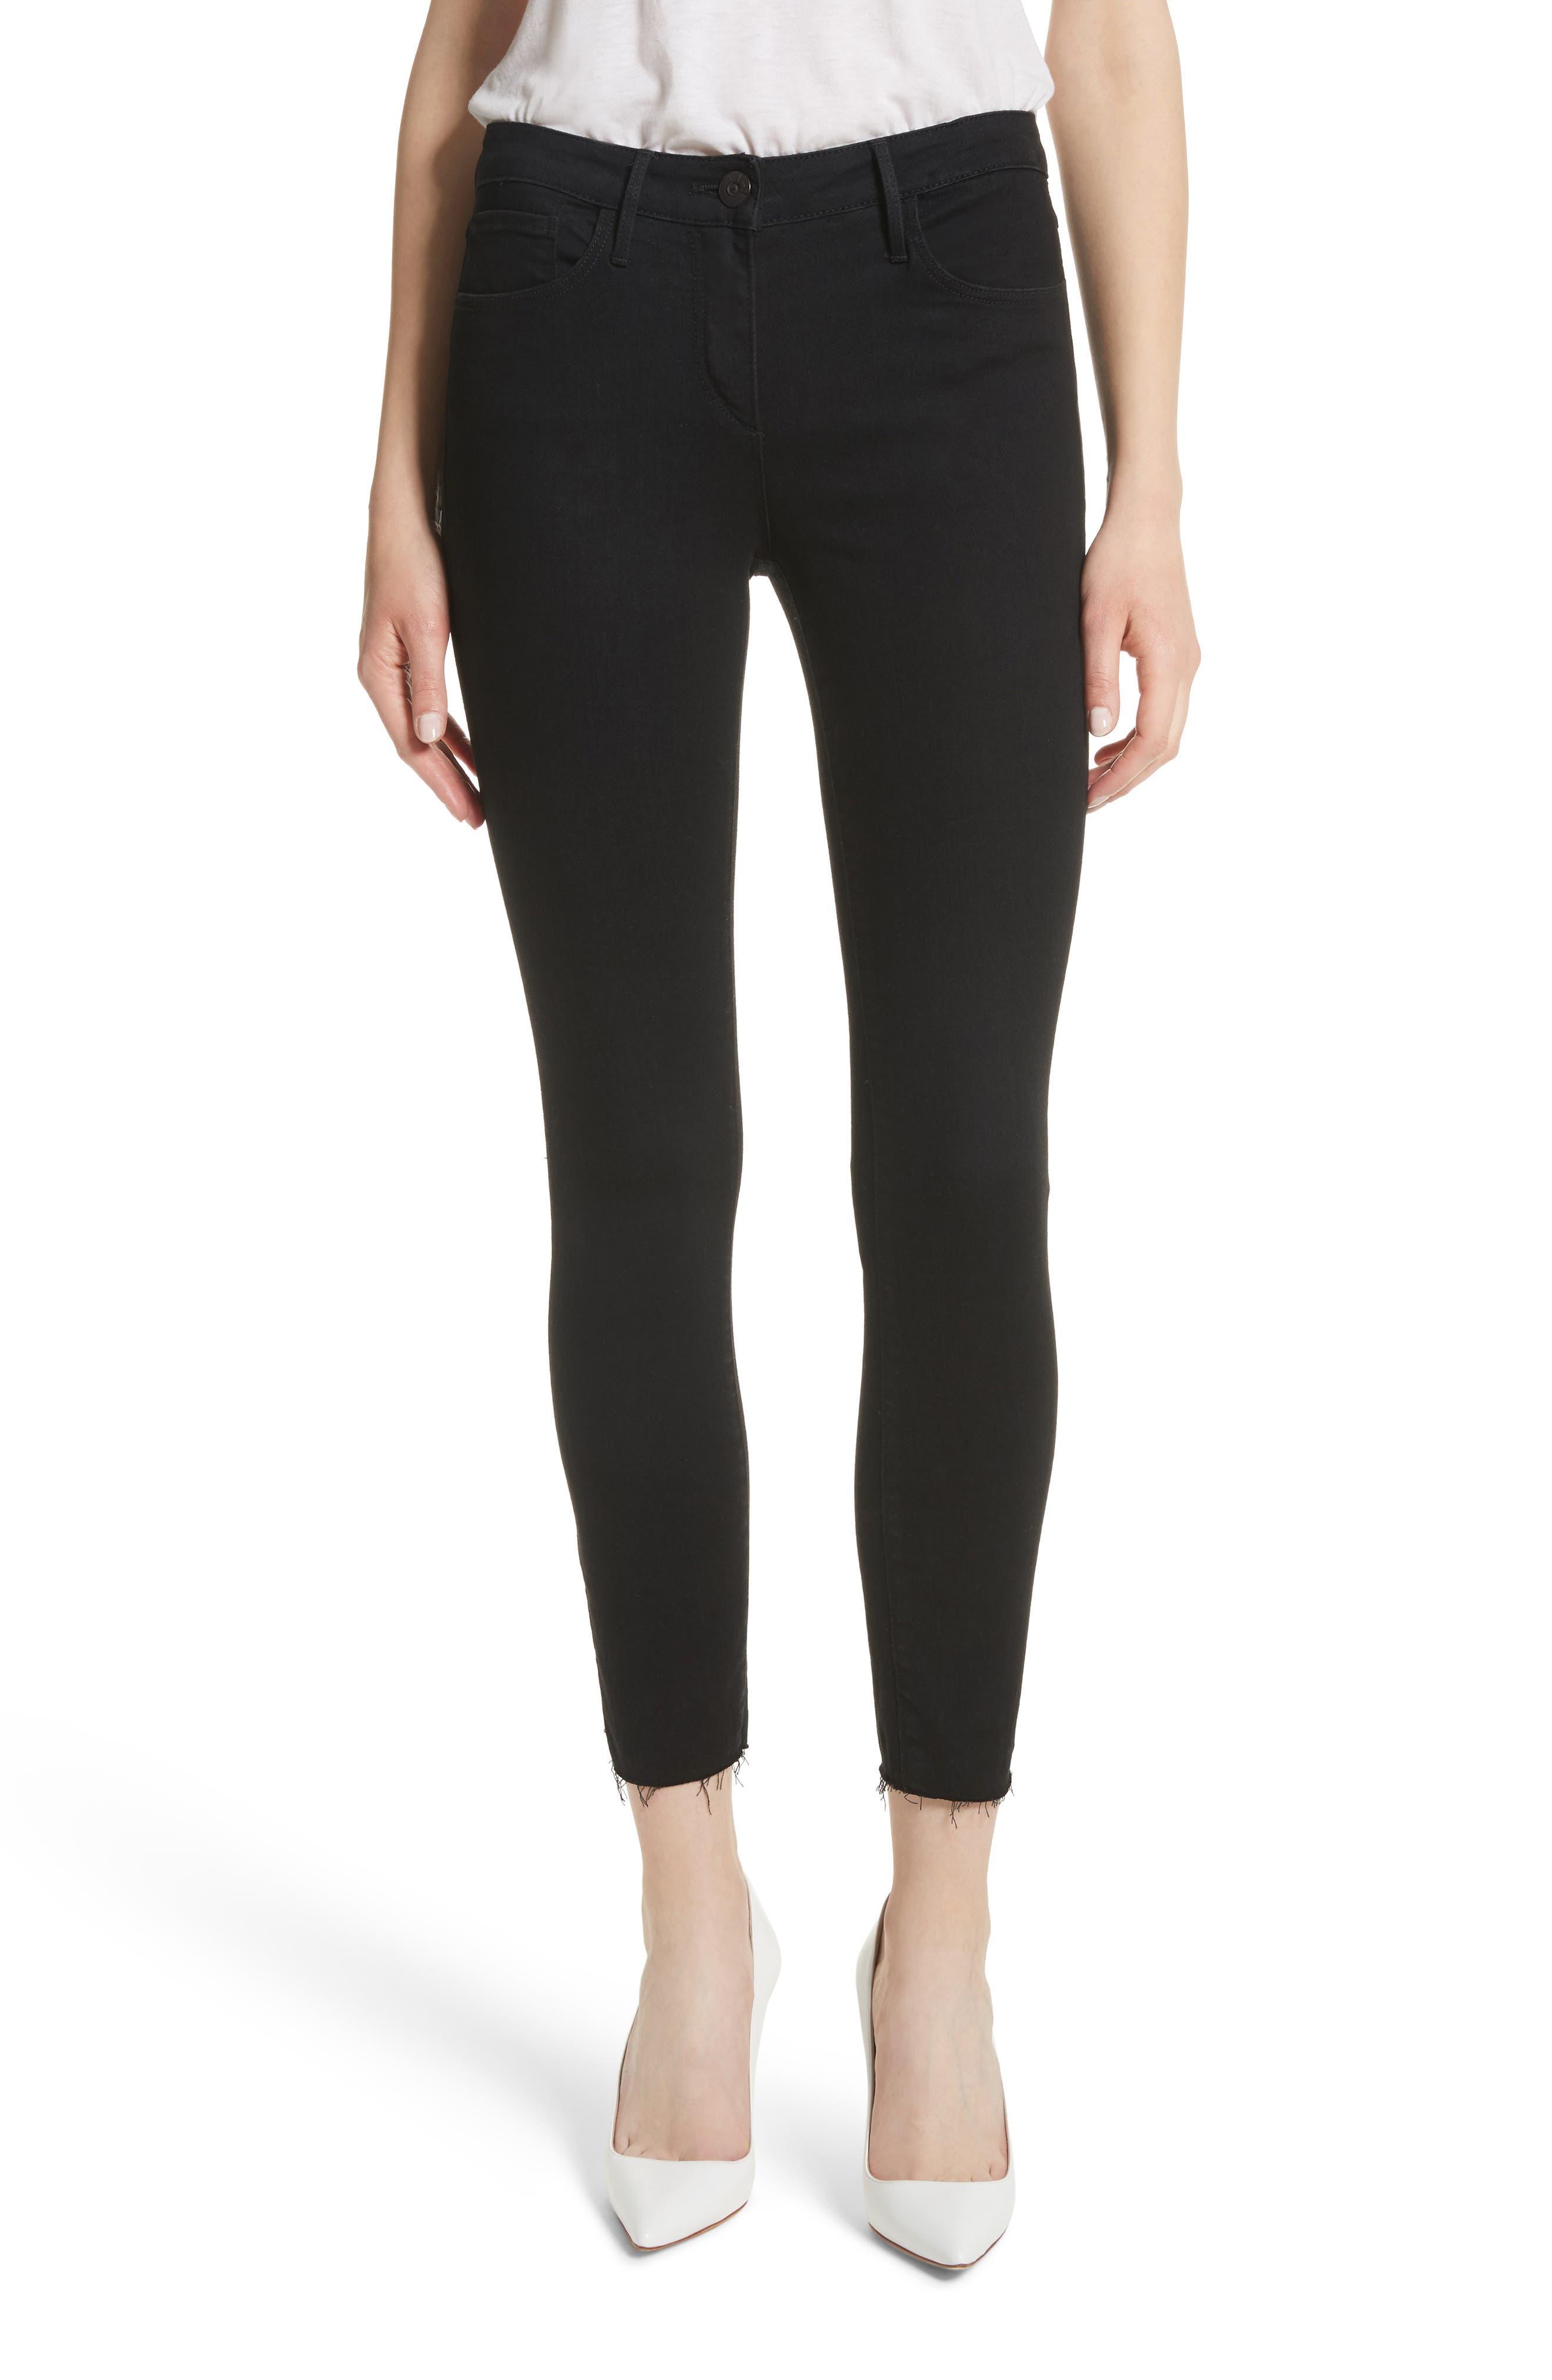 W2 Crop Skinny Jeans,                             Main thumbnail 1, color,                             Black Tear